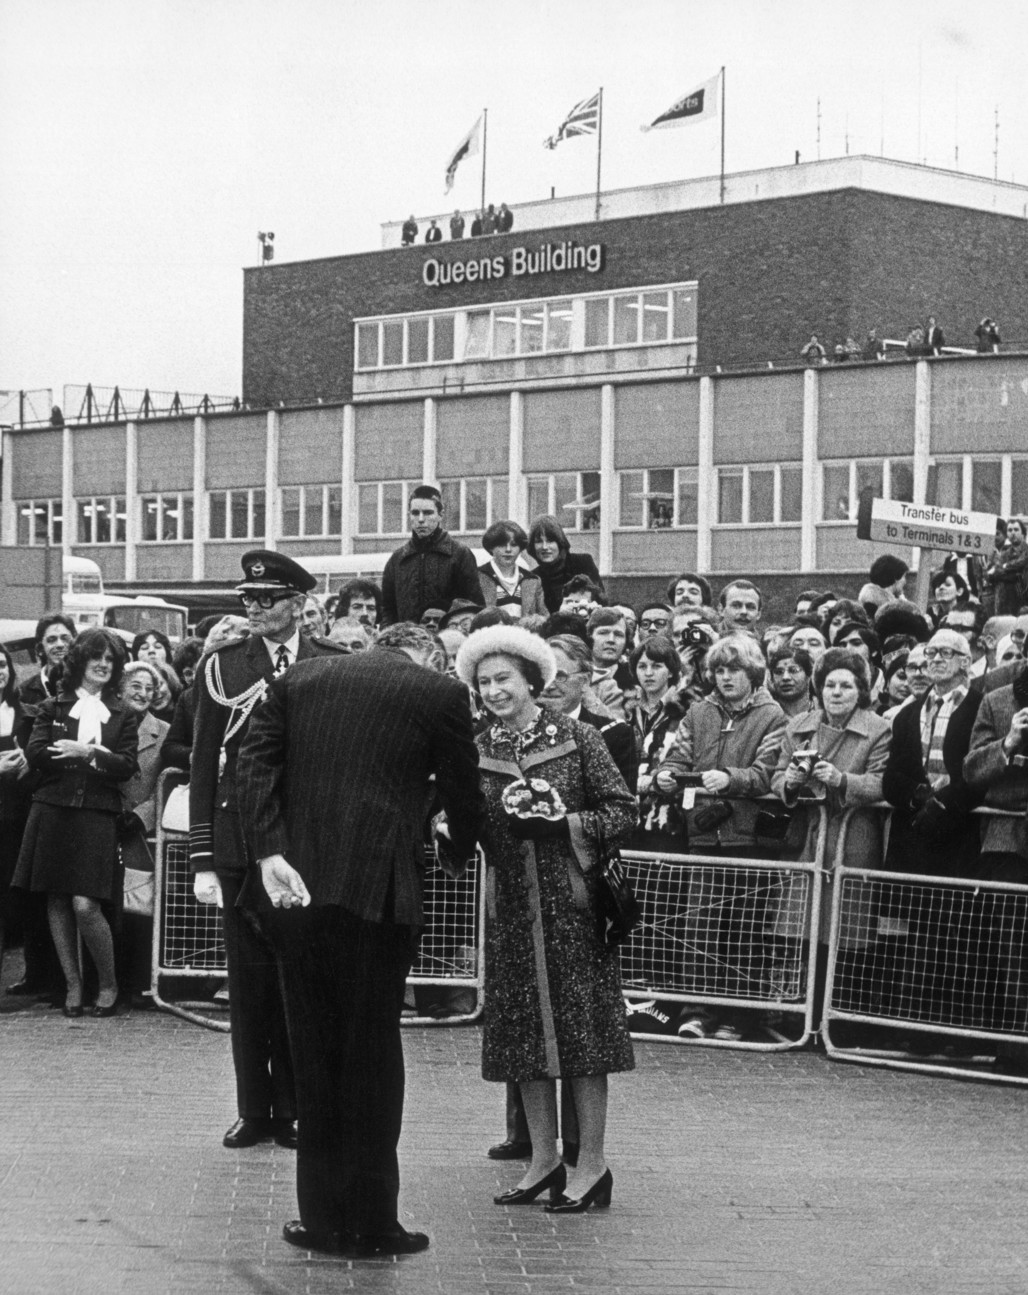 Queen Elizabeth II at the 1955 opening of Heathrow's original Terminal 2. Image via keepcalmandharryon.com.